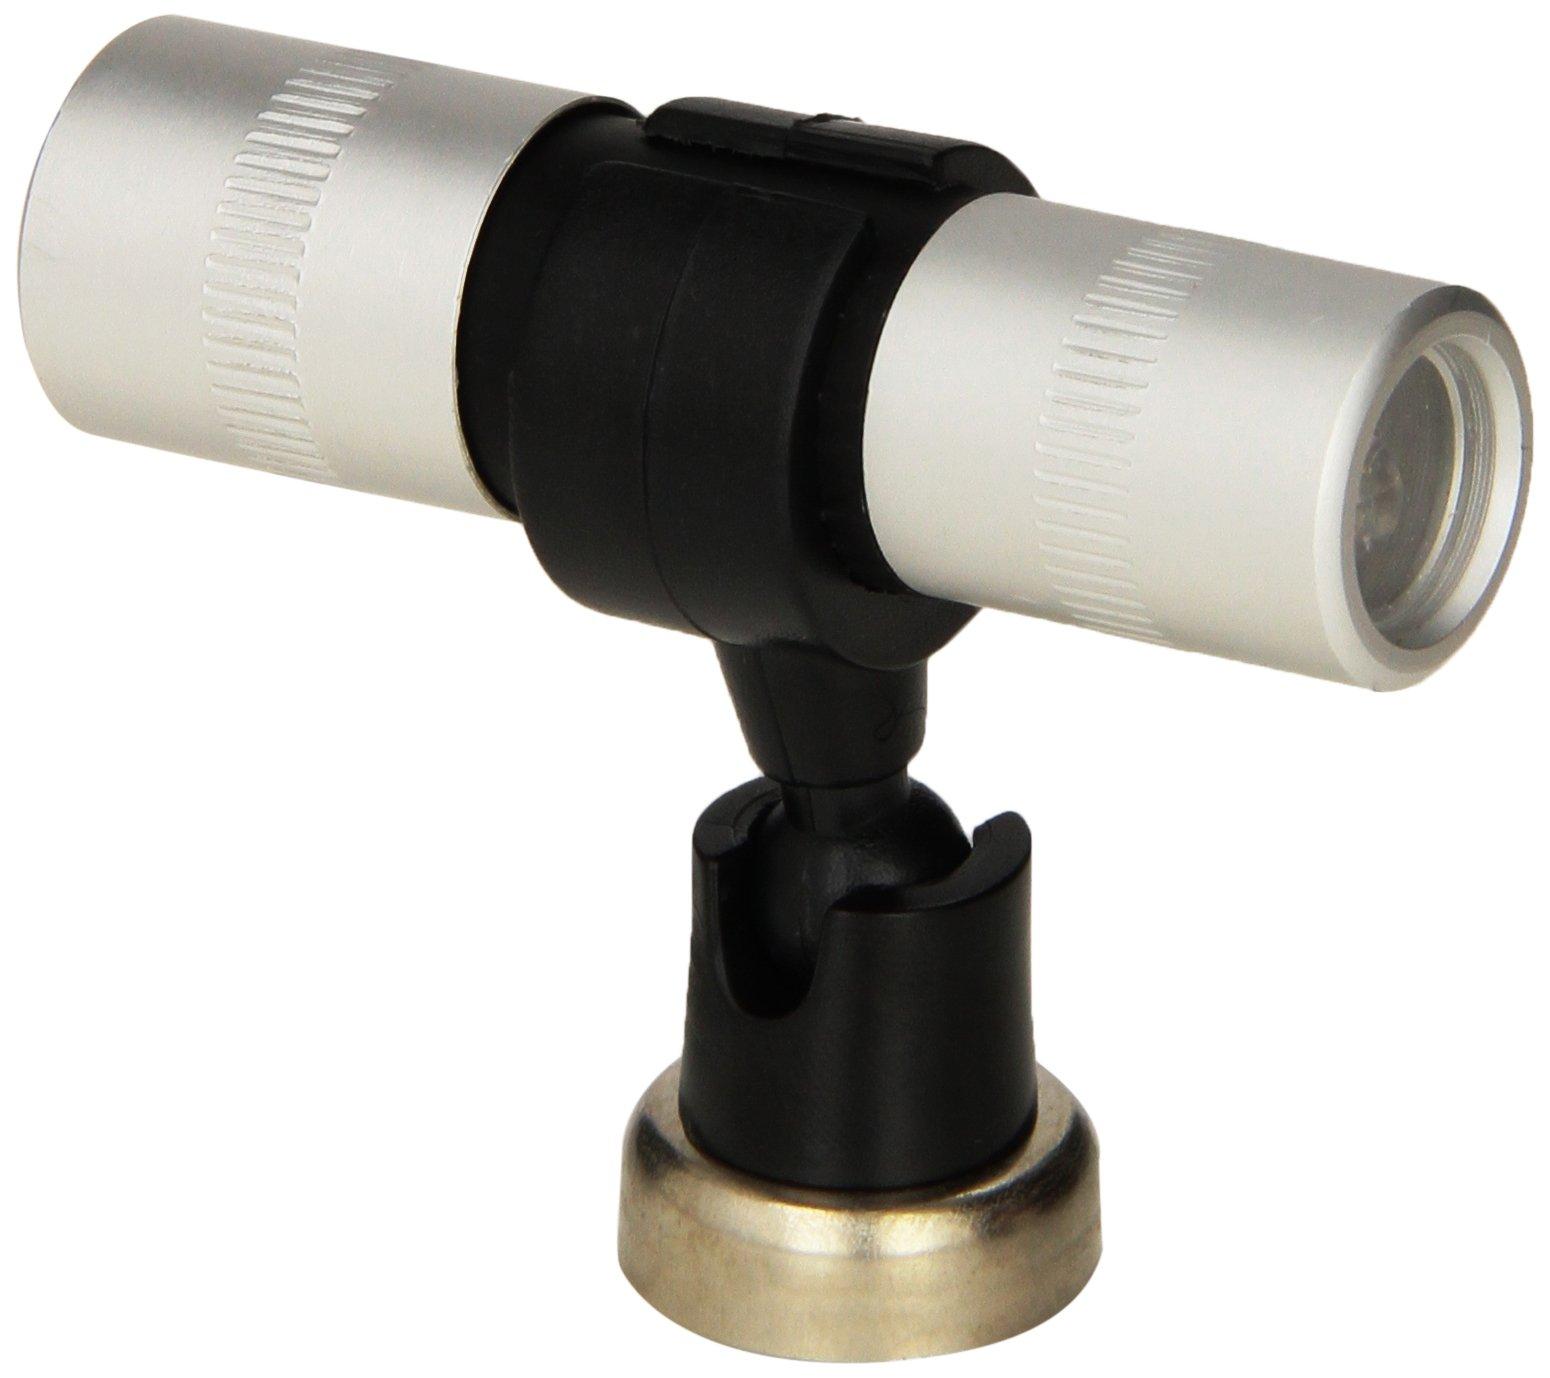 MR. BAR-B-Q 40260X Magnetic Grill Tool Light, Silver